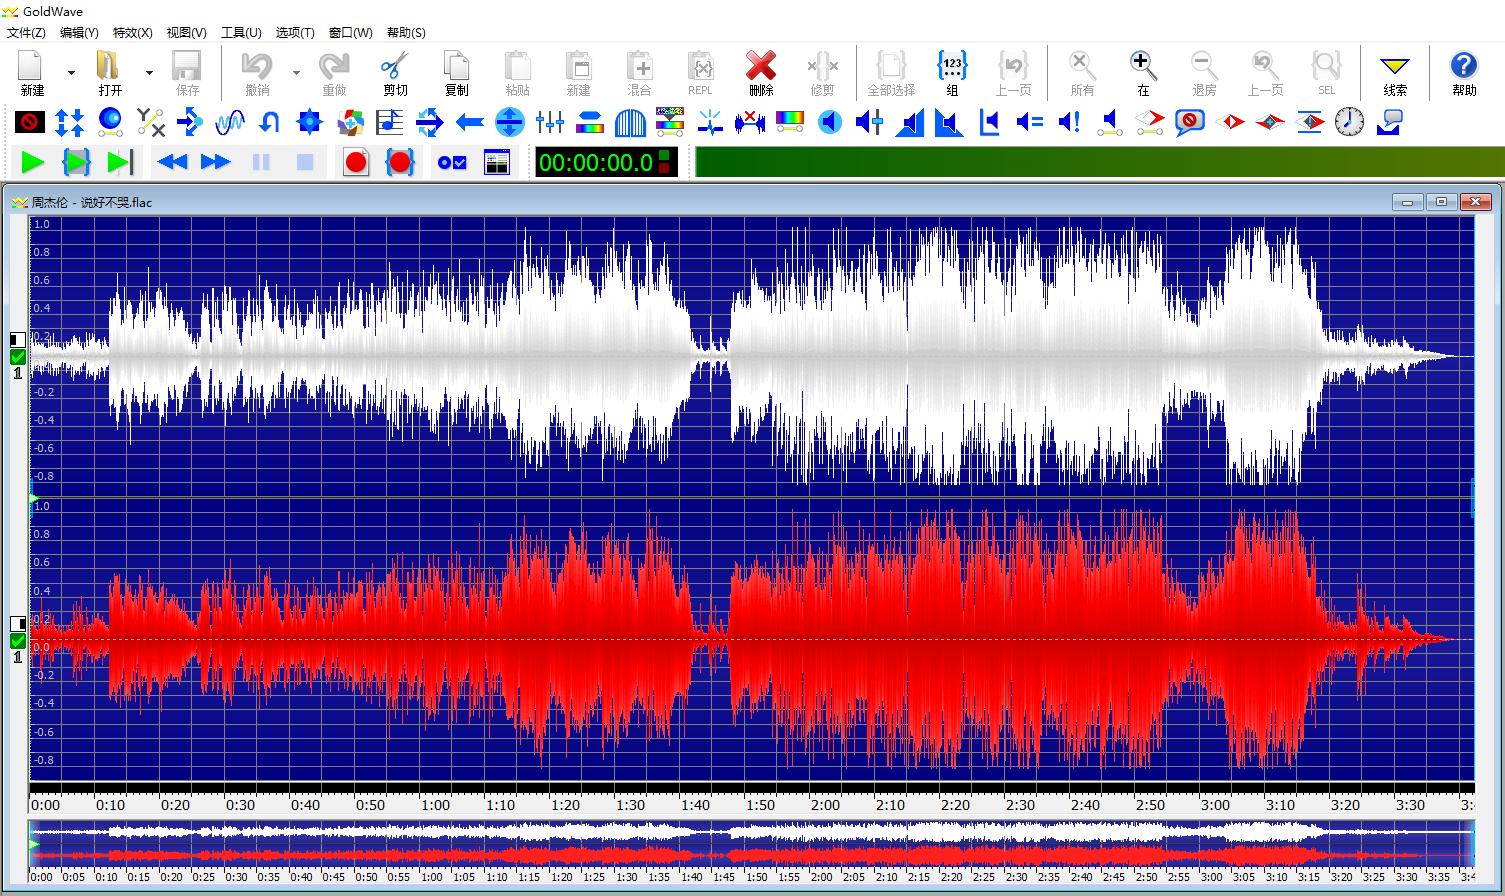 GoldWave 音频编辑工具 v6.41 最新绿色破解版分享的图片-高老四博客